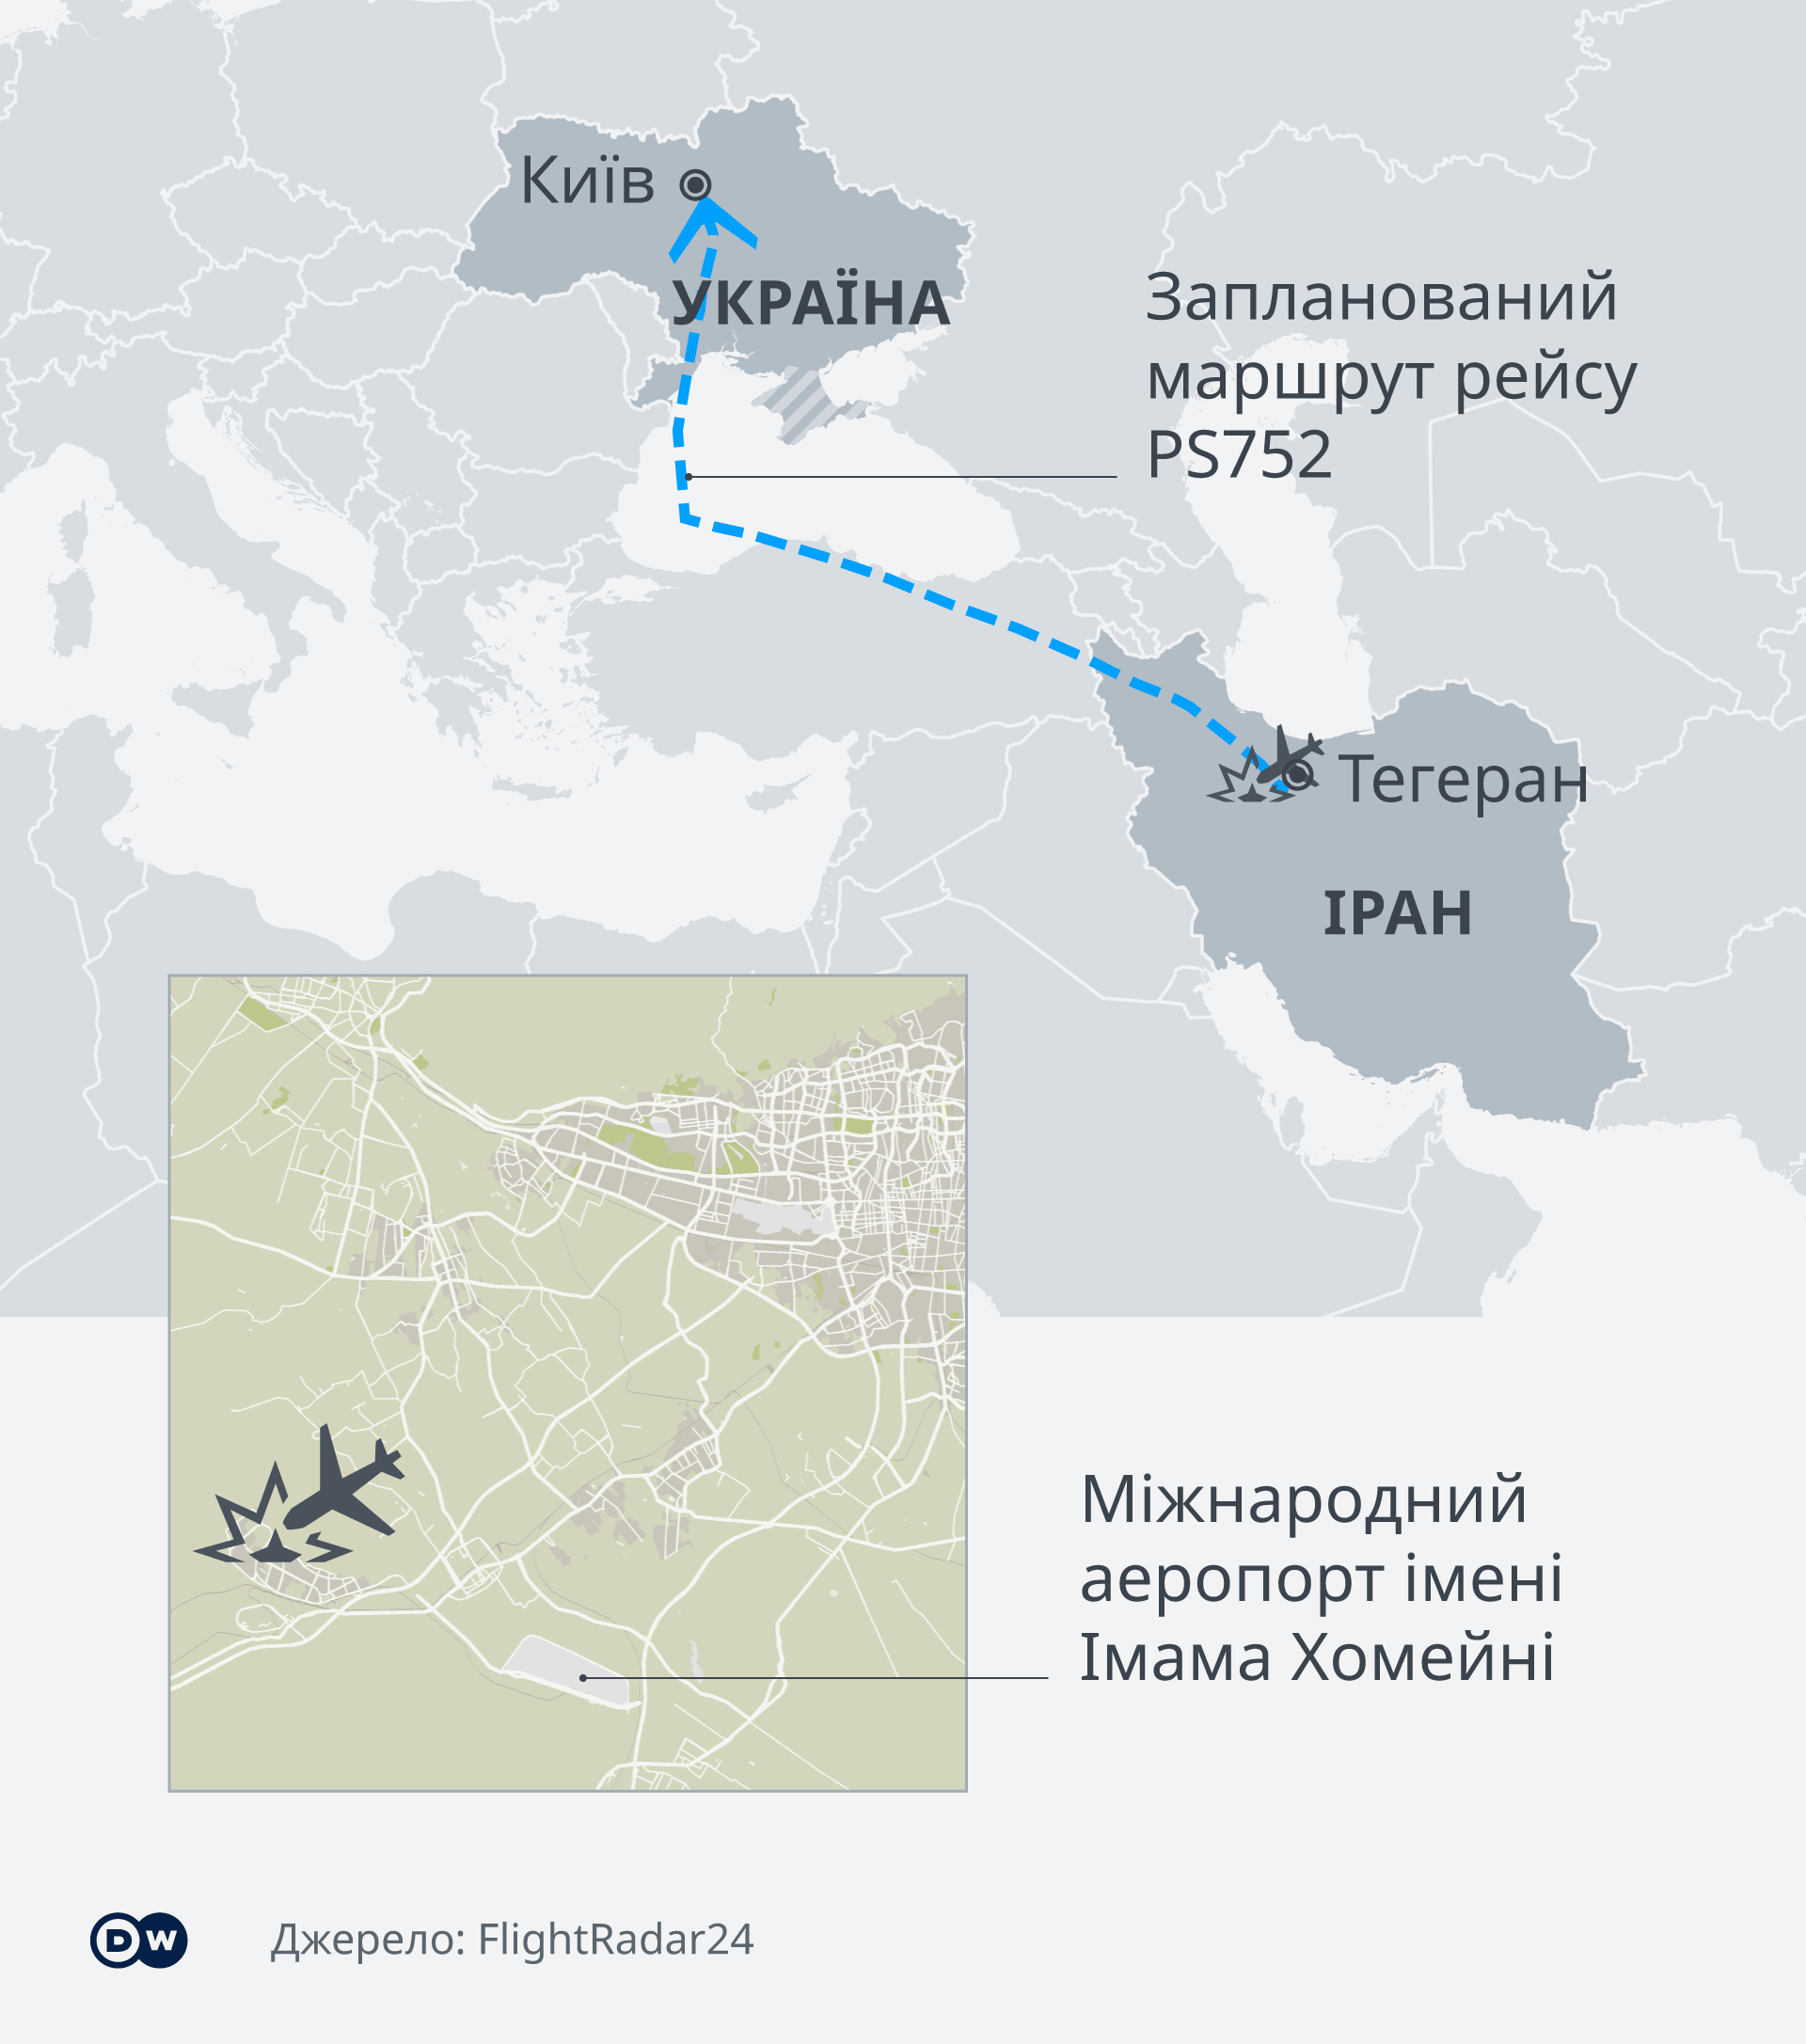 Запланований маршрут рейсу